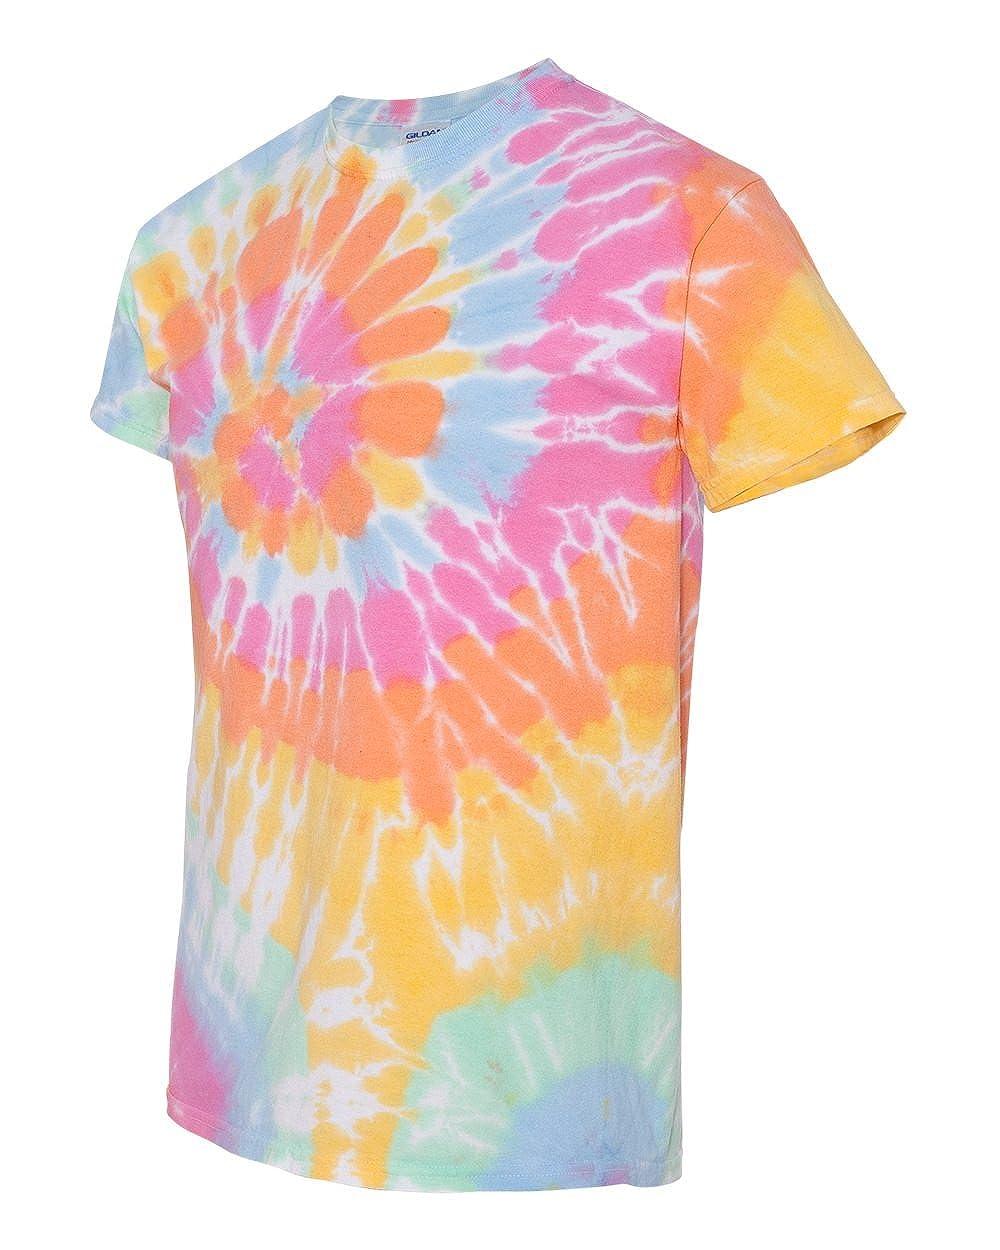 8dca81ceac9 Amazon.com  Gildan Tie-Dye Adult Rainbow Swirl Tie-Dye Tee - Aerial - S   Clothing